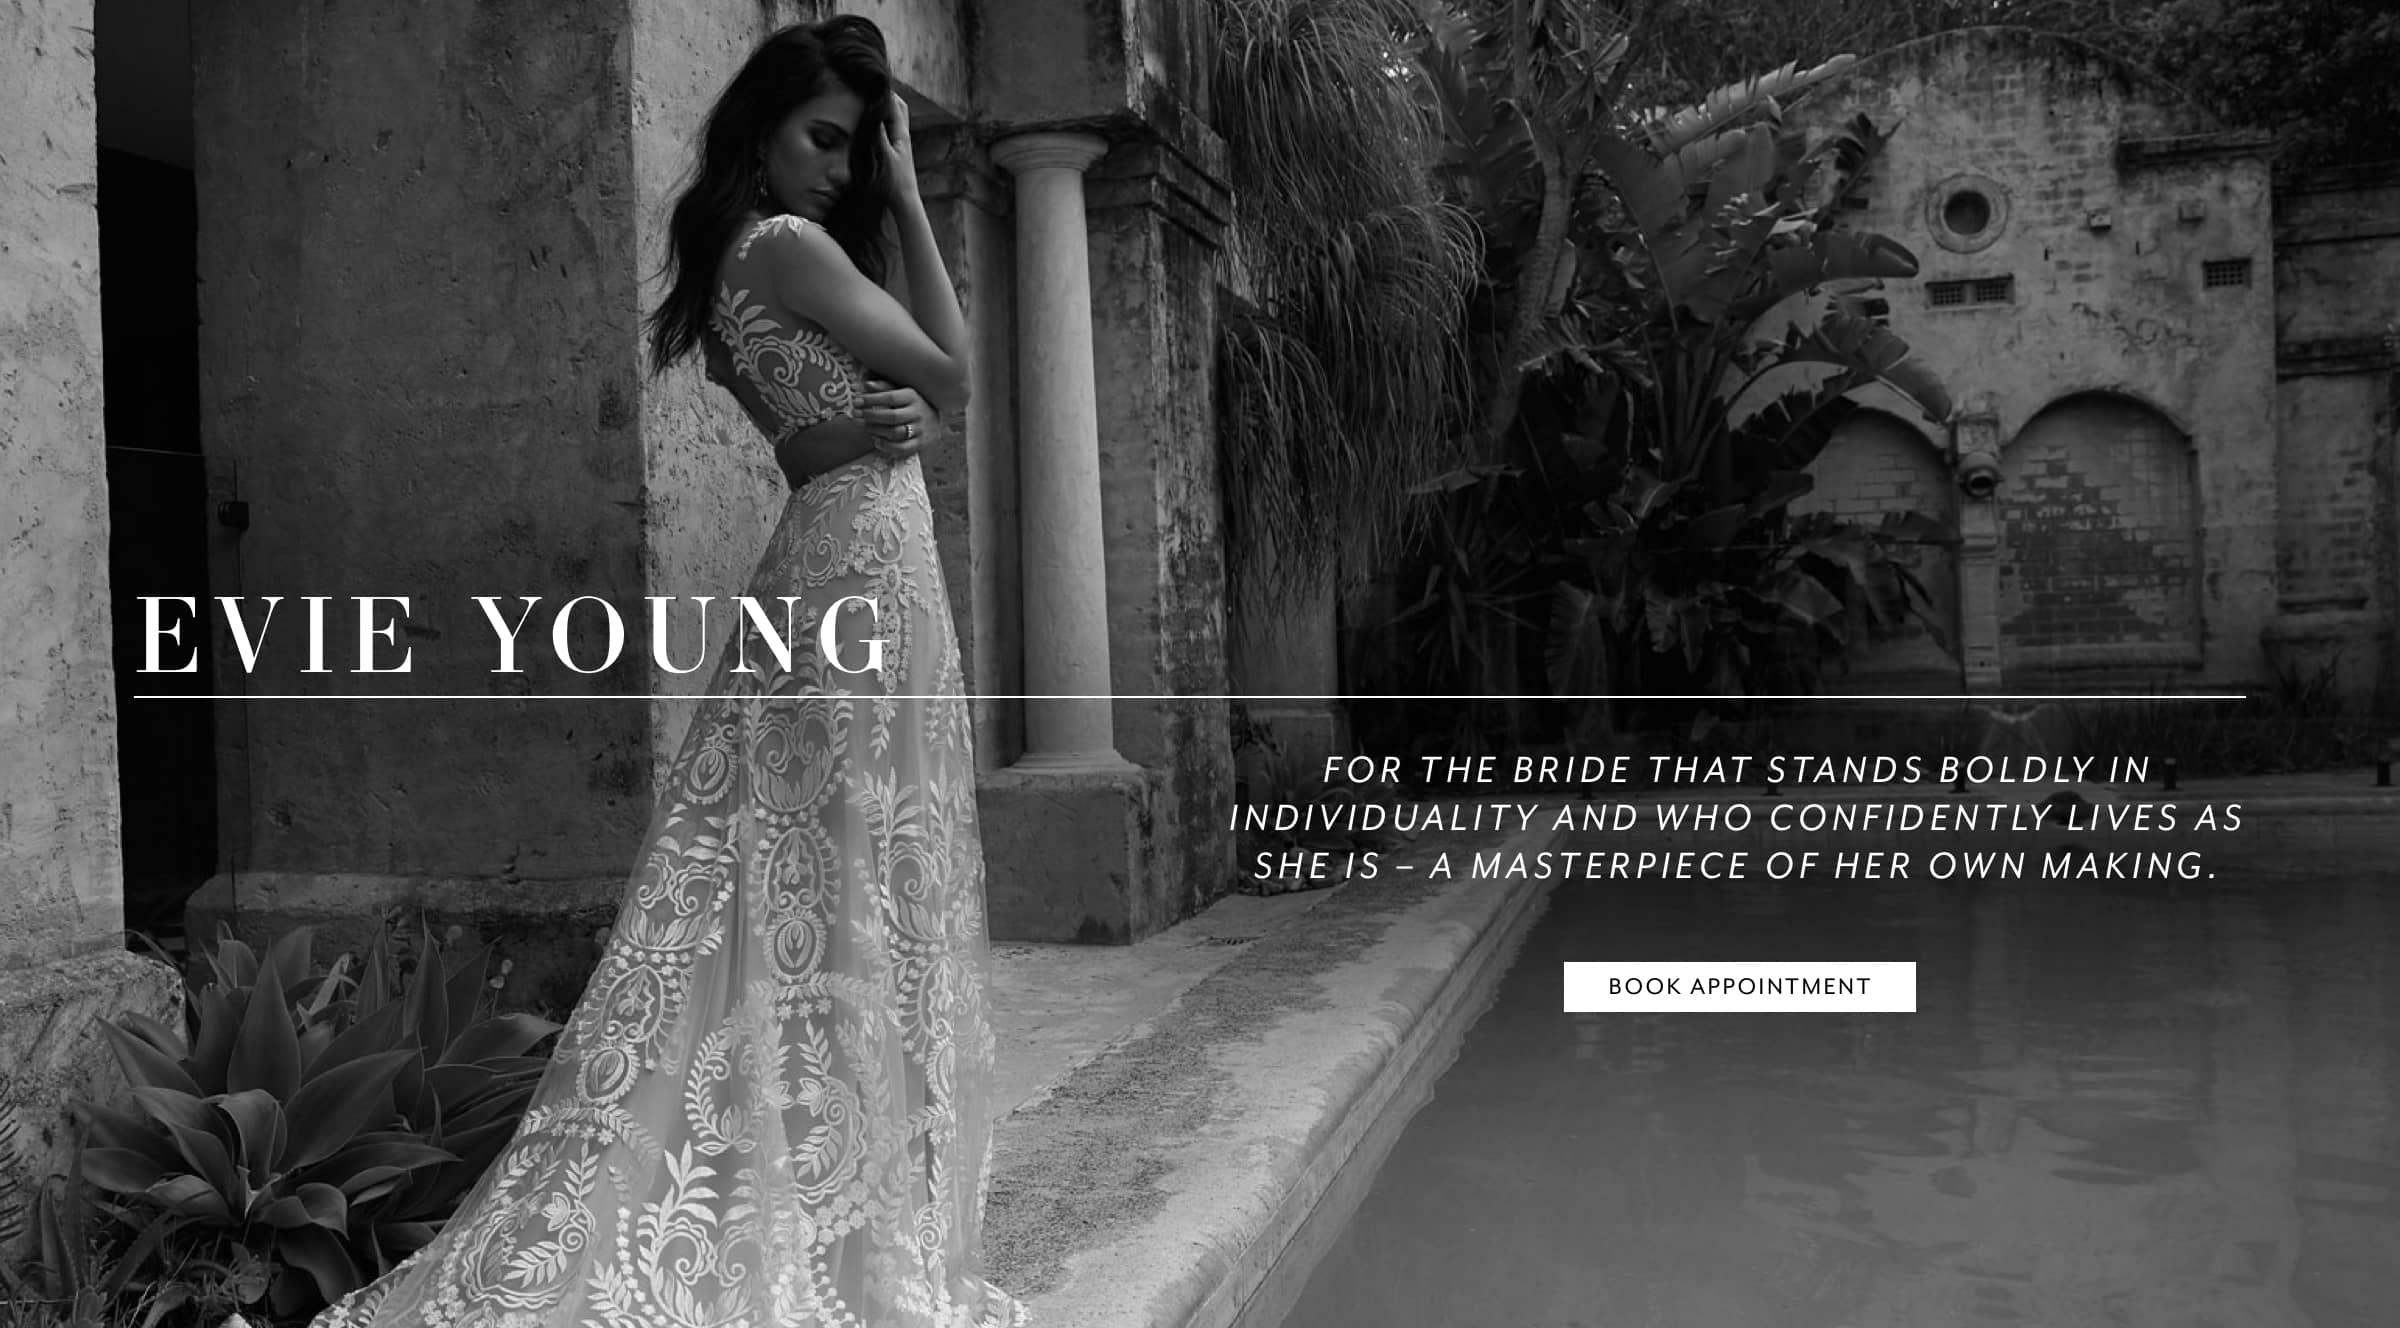 Signature Bridal Salon Designer Wedding Dresses Austin Texas,Older Brides Wedding Dresses For Over 50 Brides